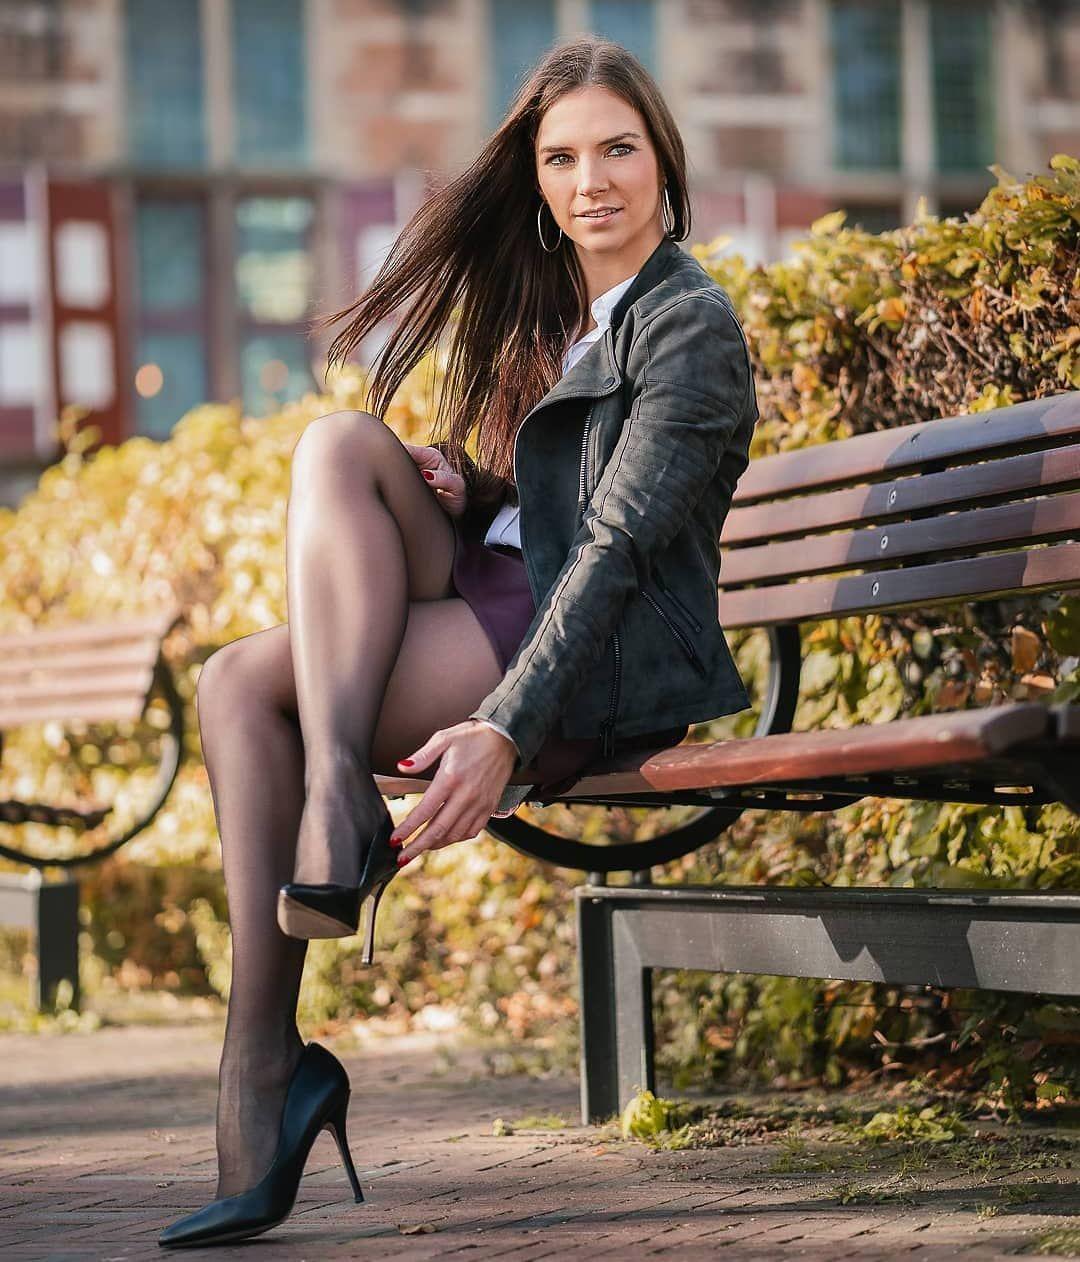 Fashion Leggings | Ripped Knee & More | PrettyLittleThing.com